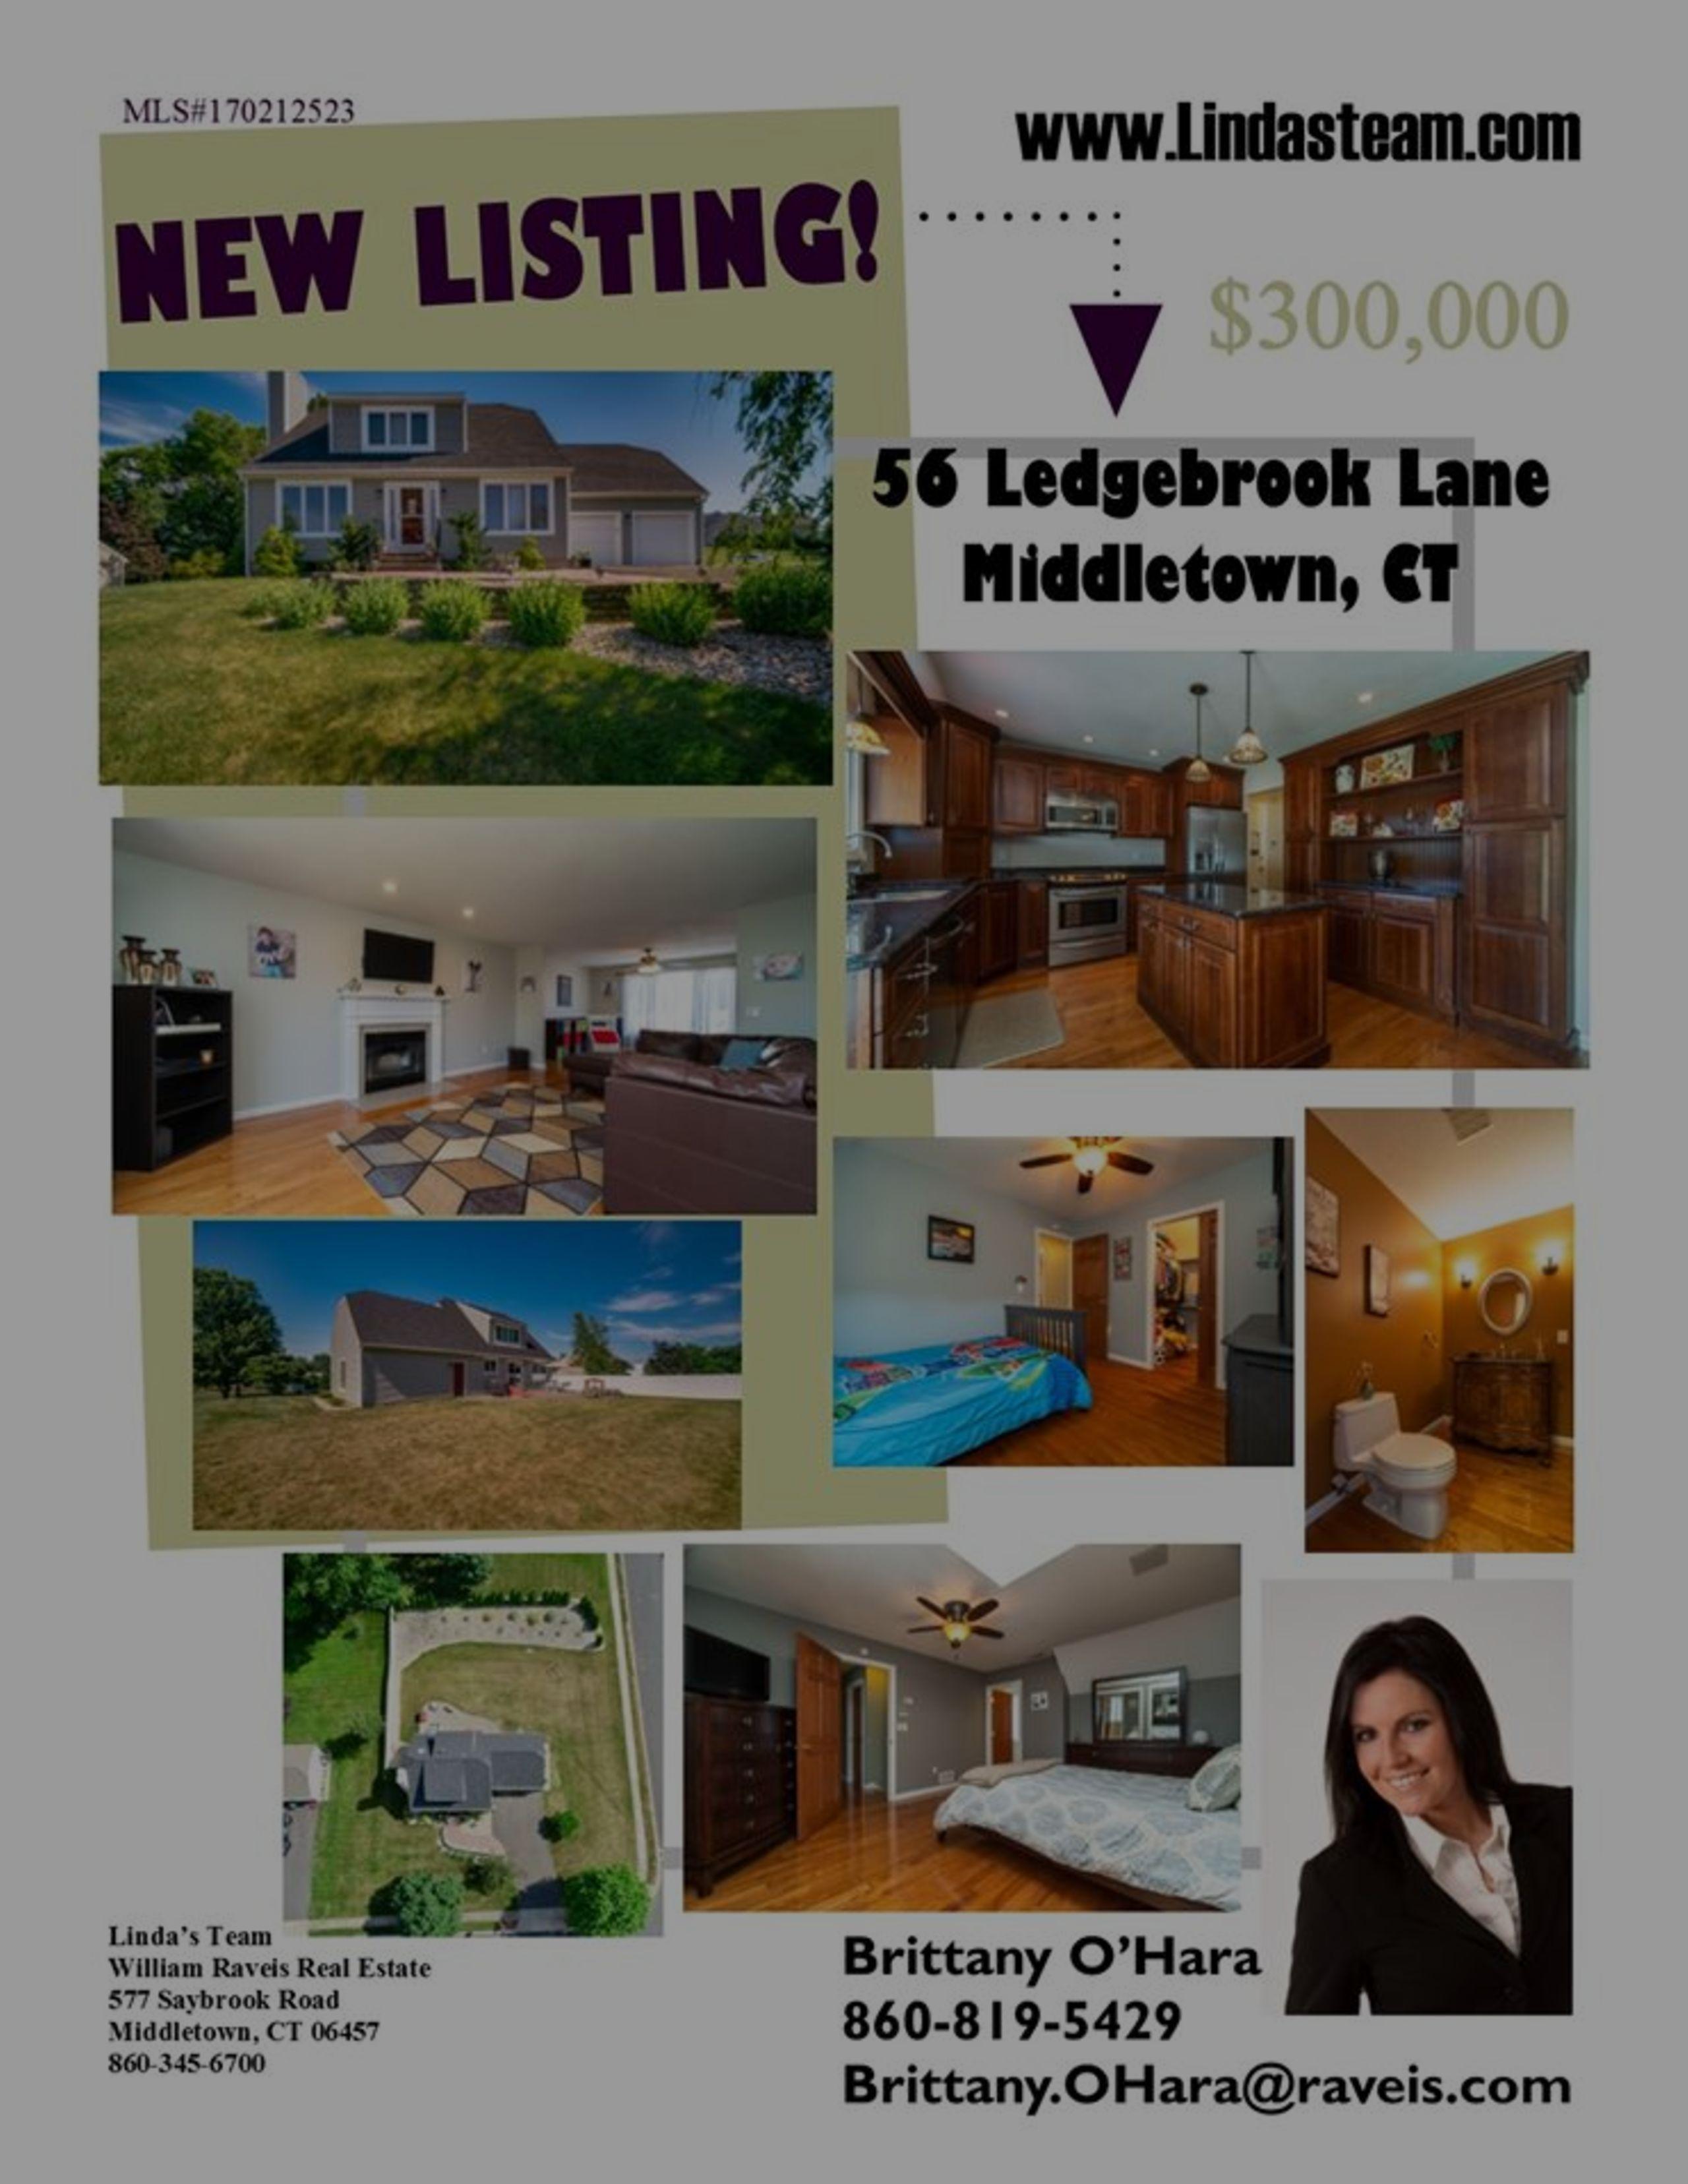 *NEW LISTING* 56 Ledgebrook Lane Middletown, CT 06457